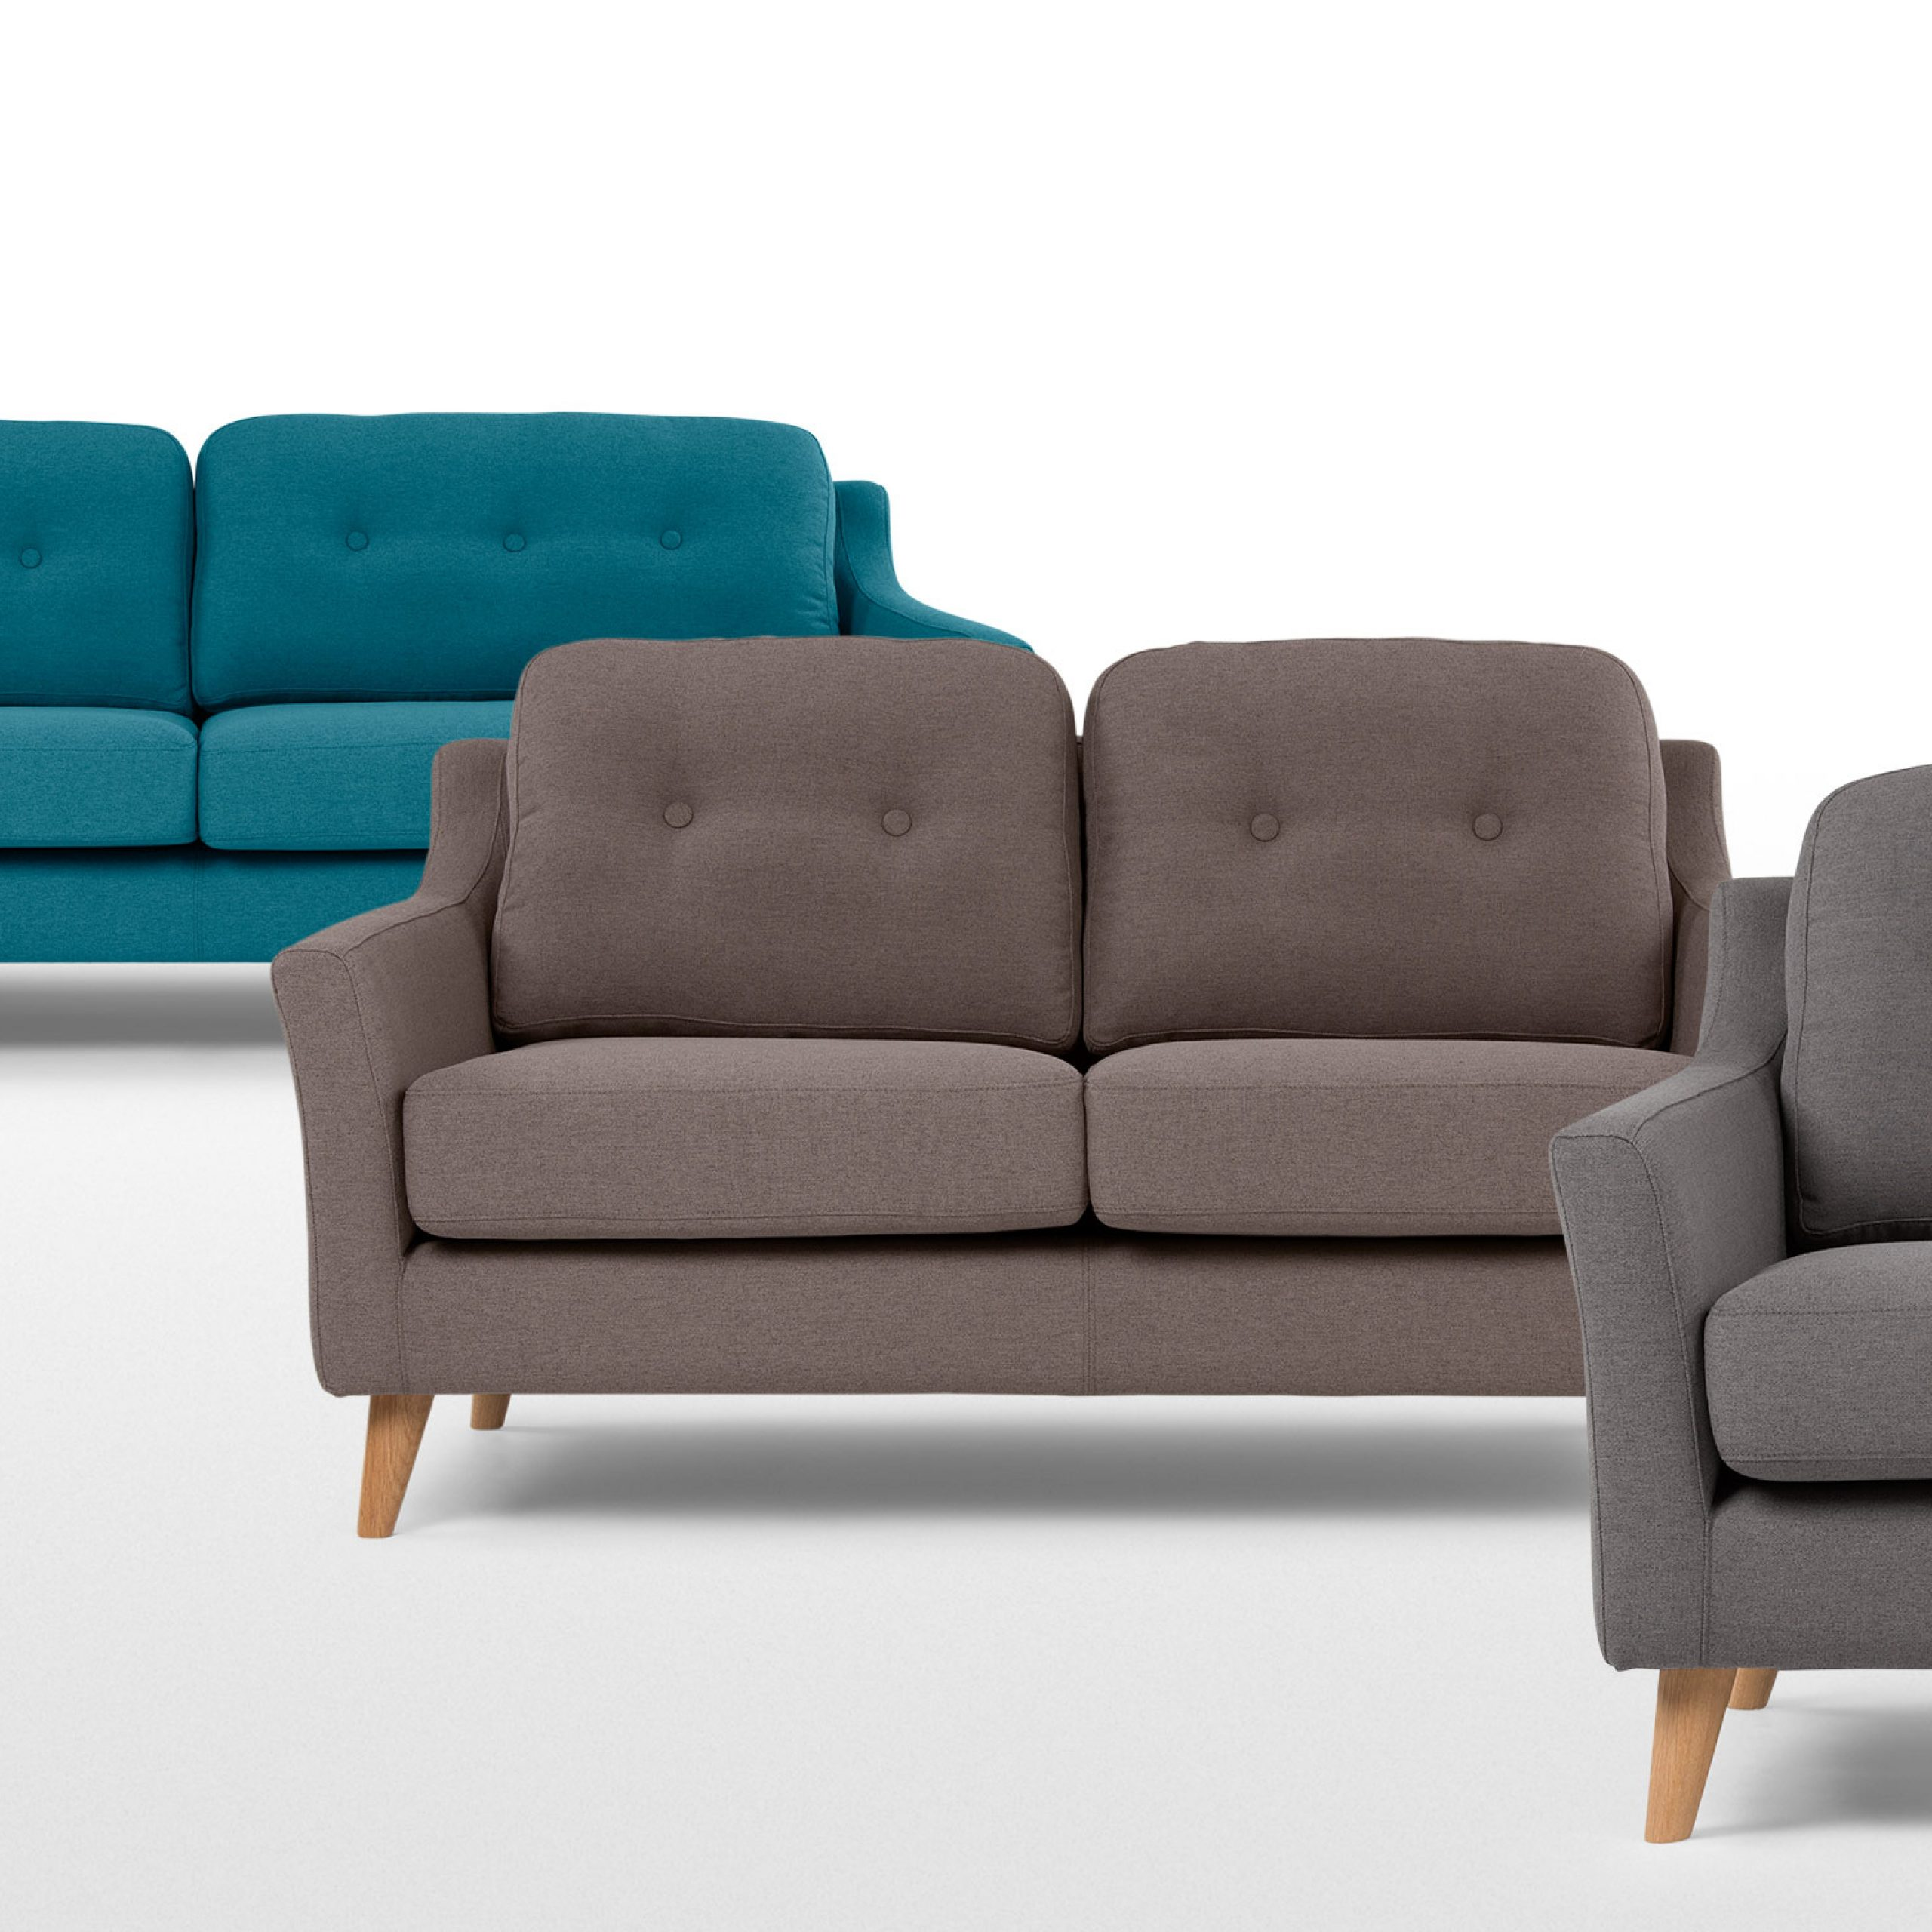 Rufus 2 Seater Sofa, Rhino Grey   Made With Regard To 2 Seater Sofas (View 11 of 15)